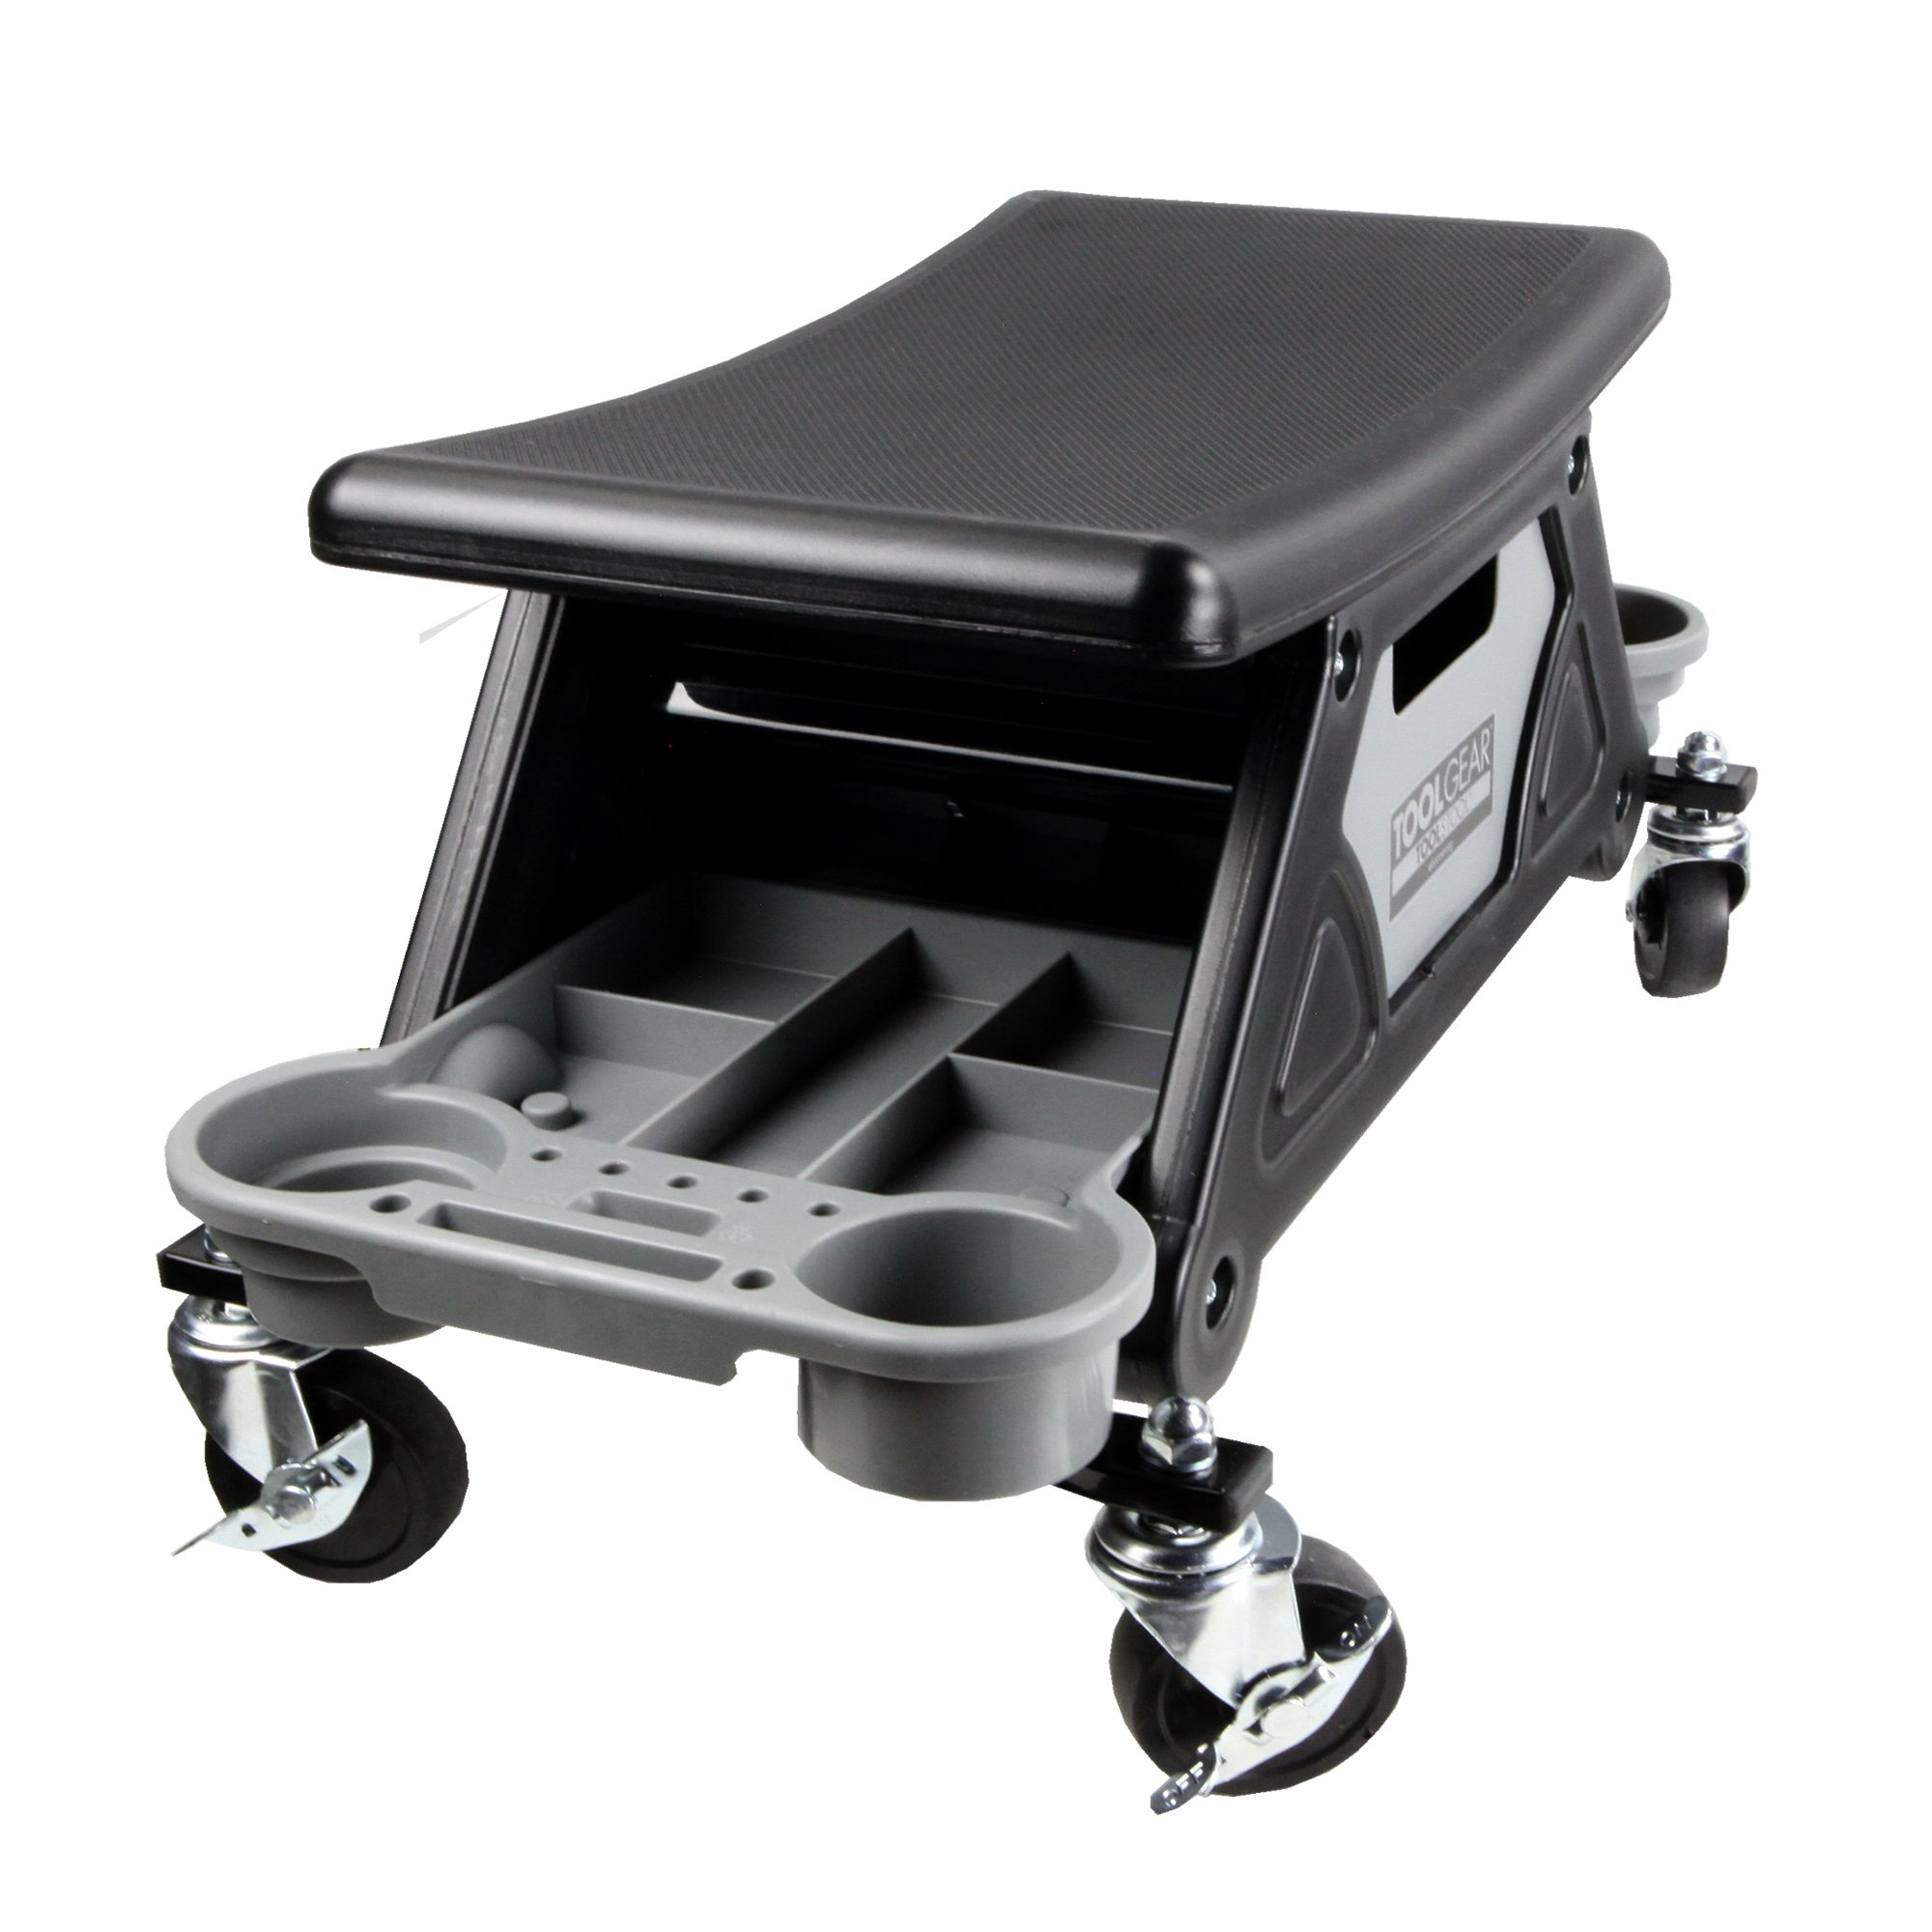 Boomerang ToolStool Roller-Seat Shop-Cart by Boomerang (Image #5)